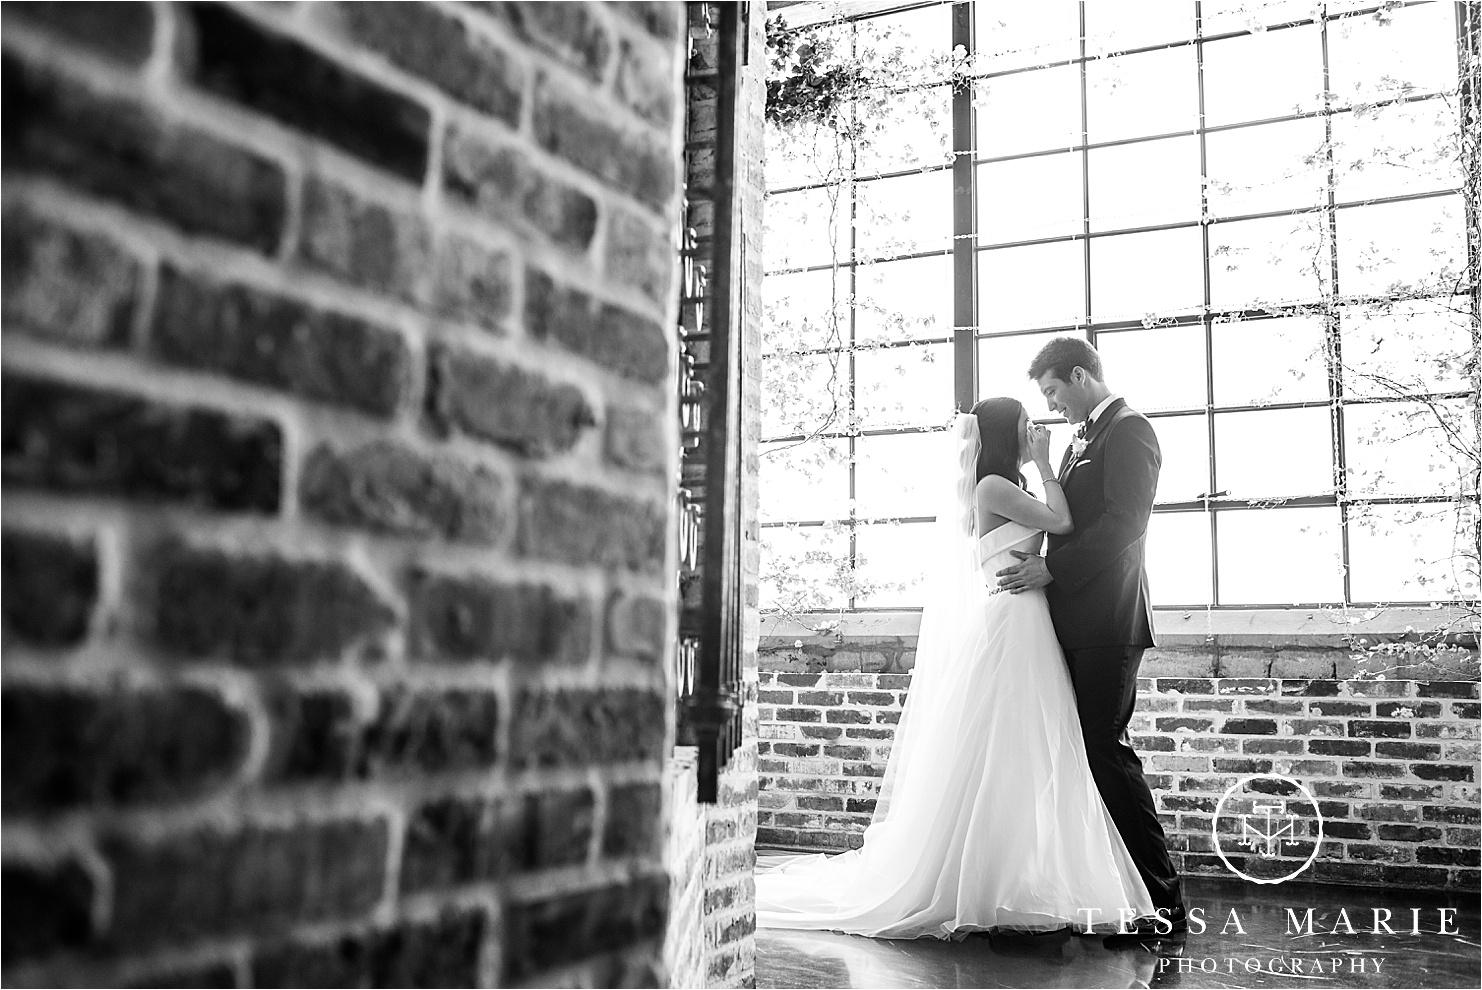 Tessa_marie_weddings_houston_wedding_photographer_The_astorian_0052.jpg